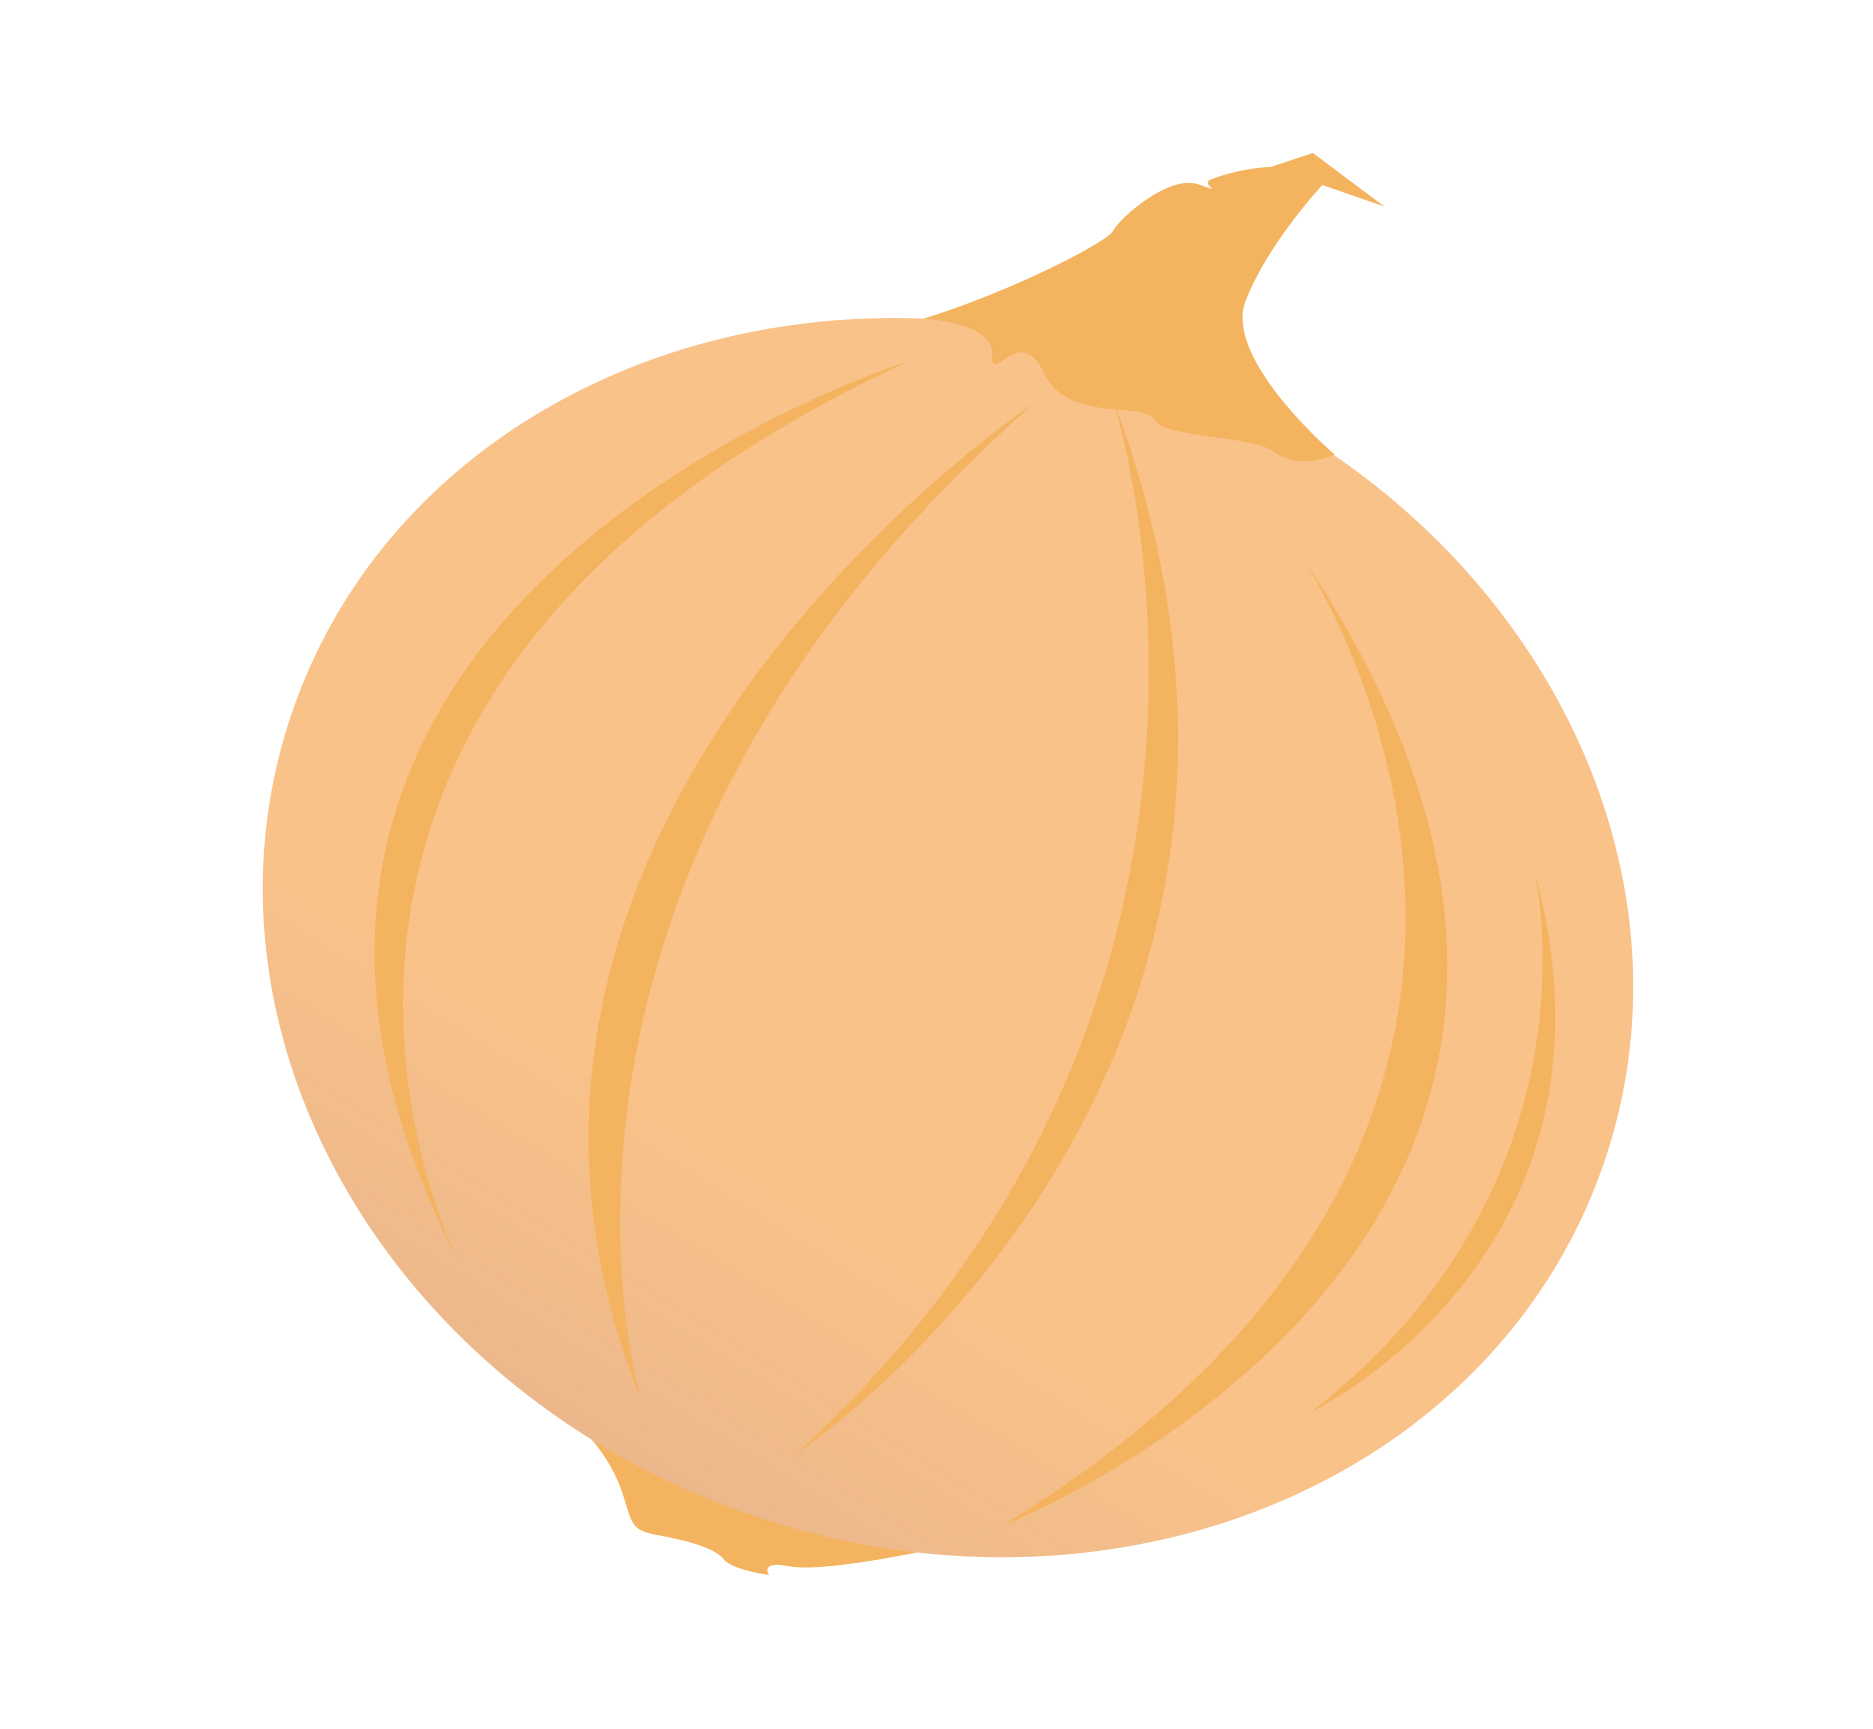 Onion Clip Art N19 free image.